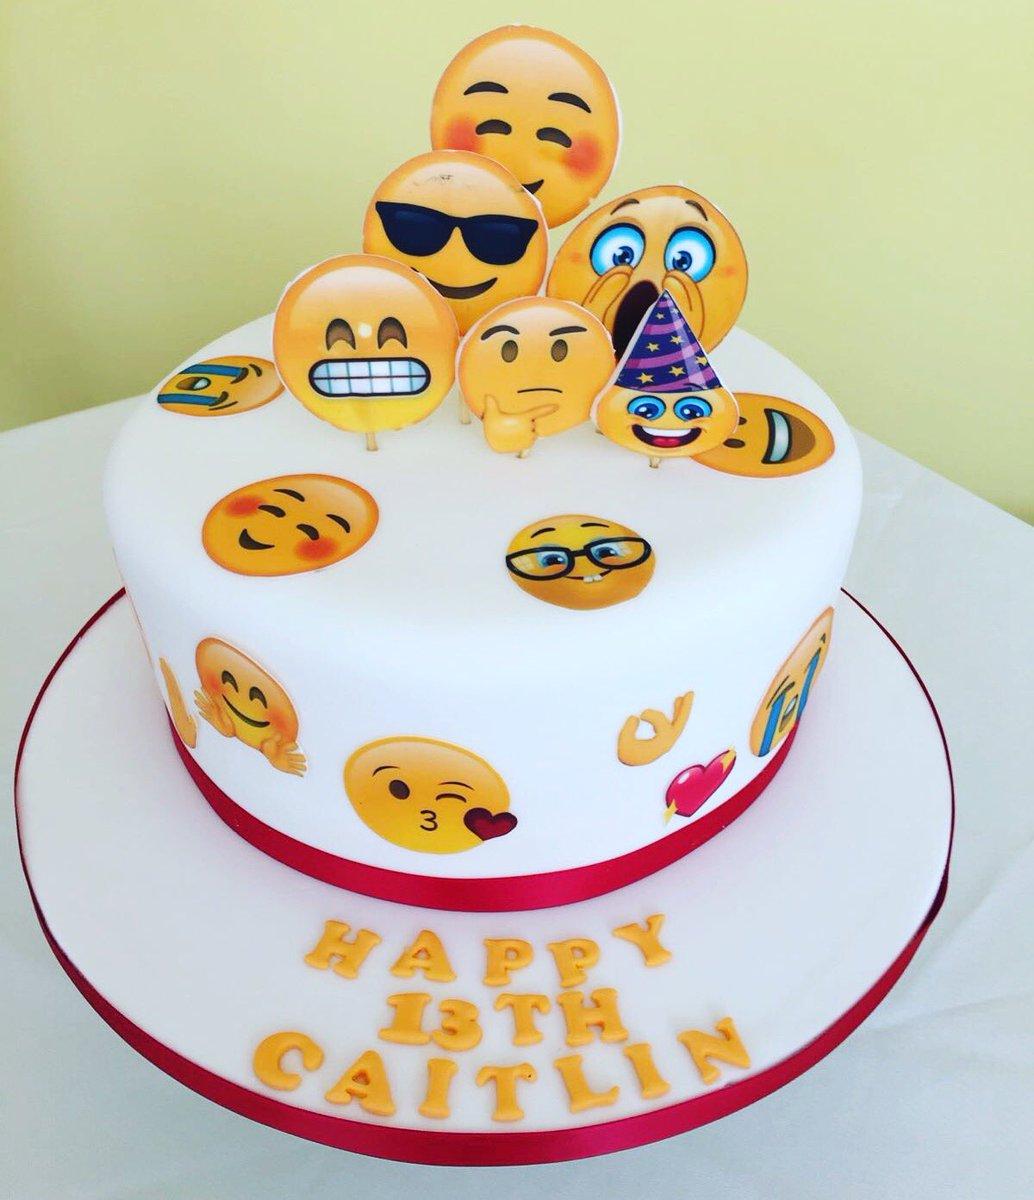 Nice To Ice Grimsby On Twitter Happy Emoji Birthday Cake With